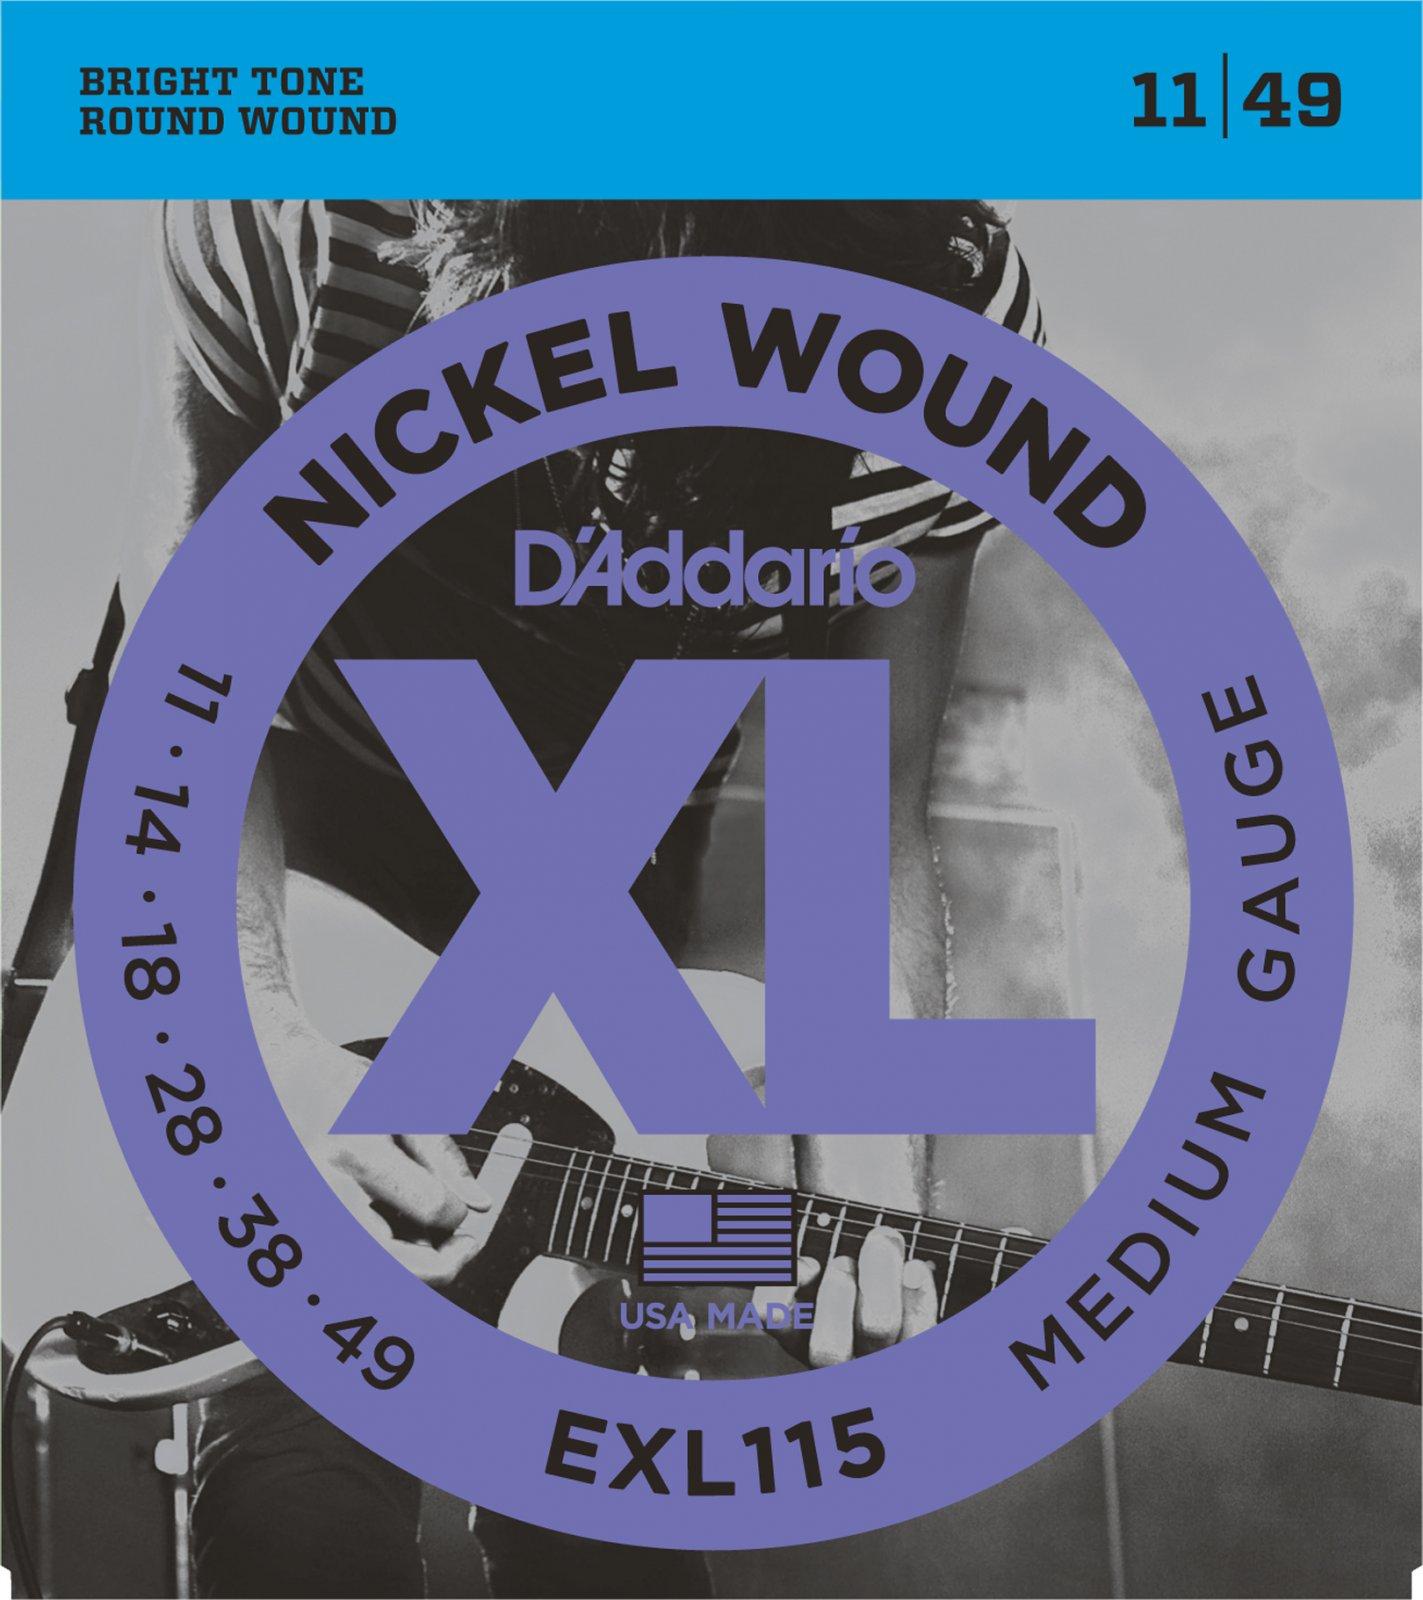 D'Addario XL Nickel Wound EXL115 Electric Guitar Strings, Medium/Blues-Jazz Rock, 11-49